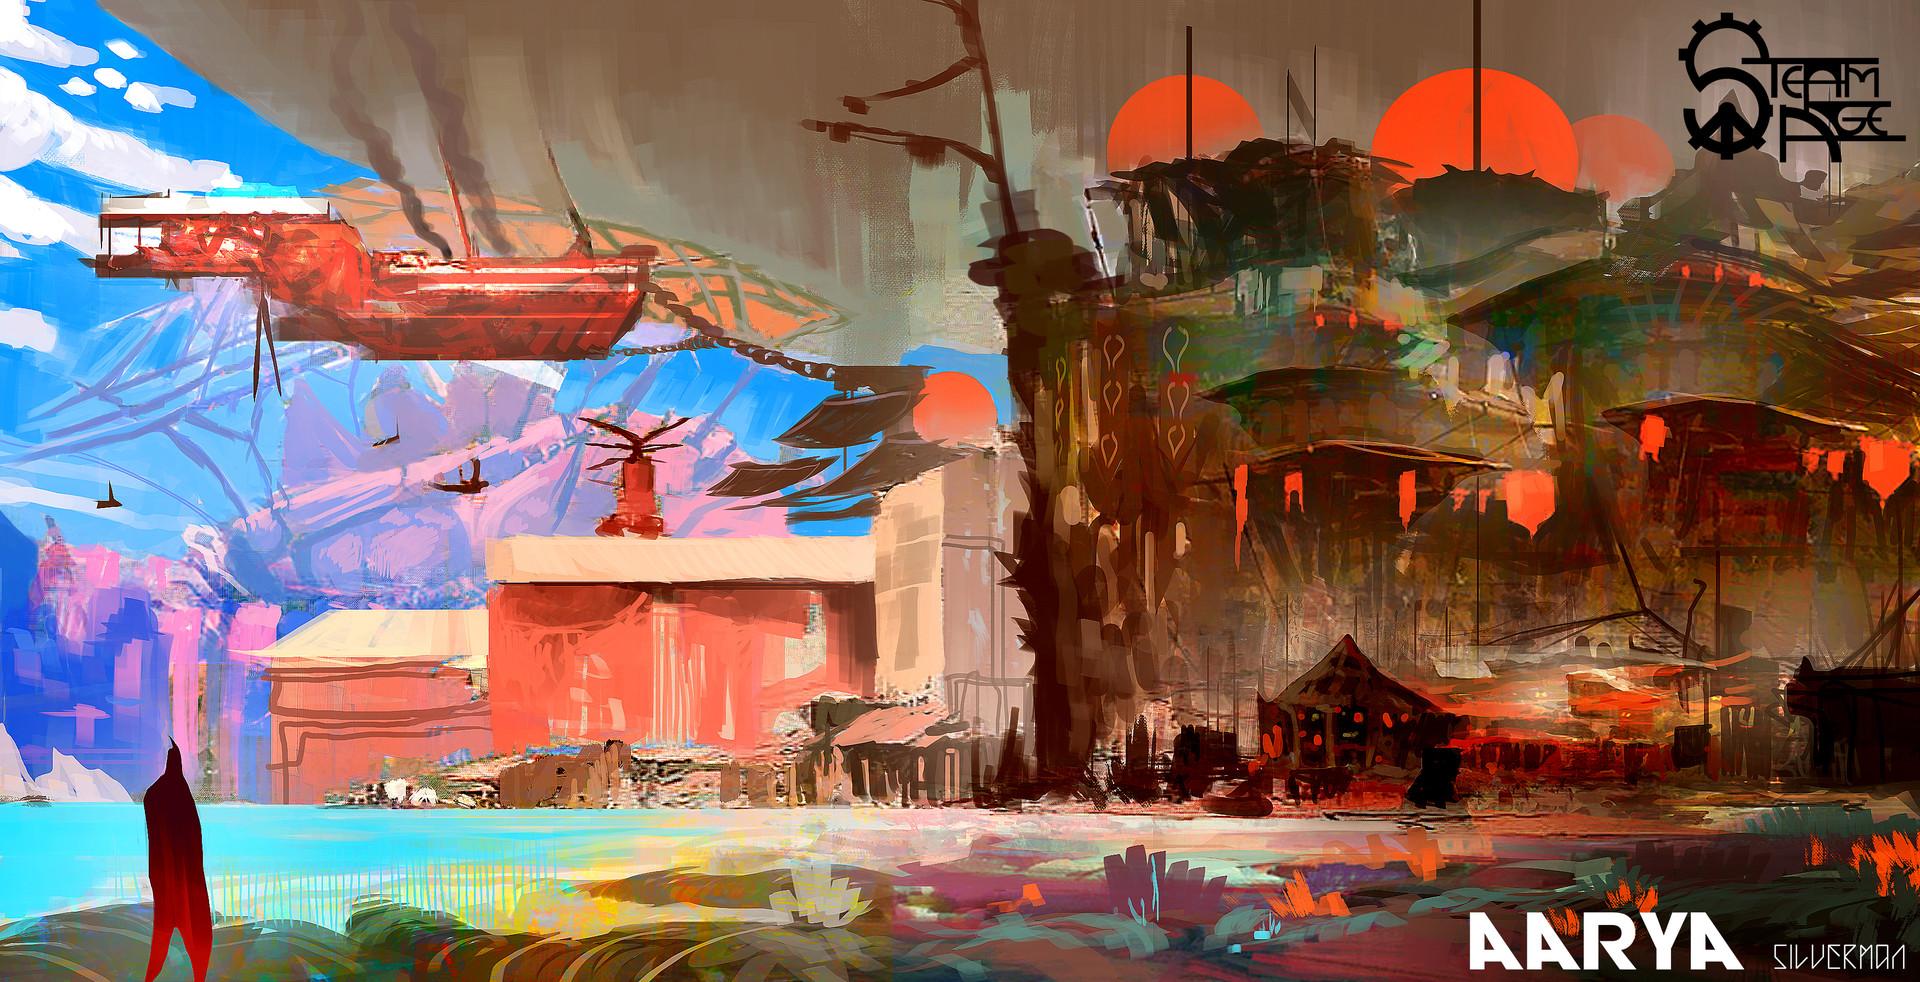 Samuel silverman aarya city concept 2